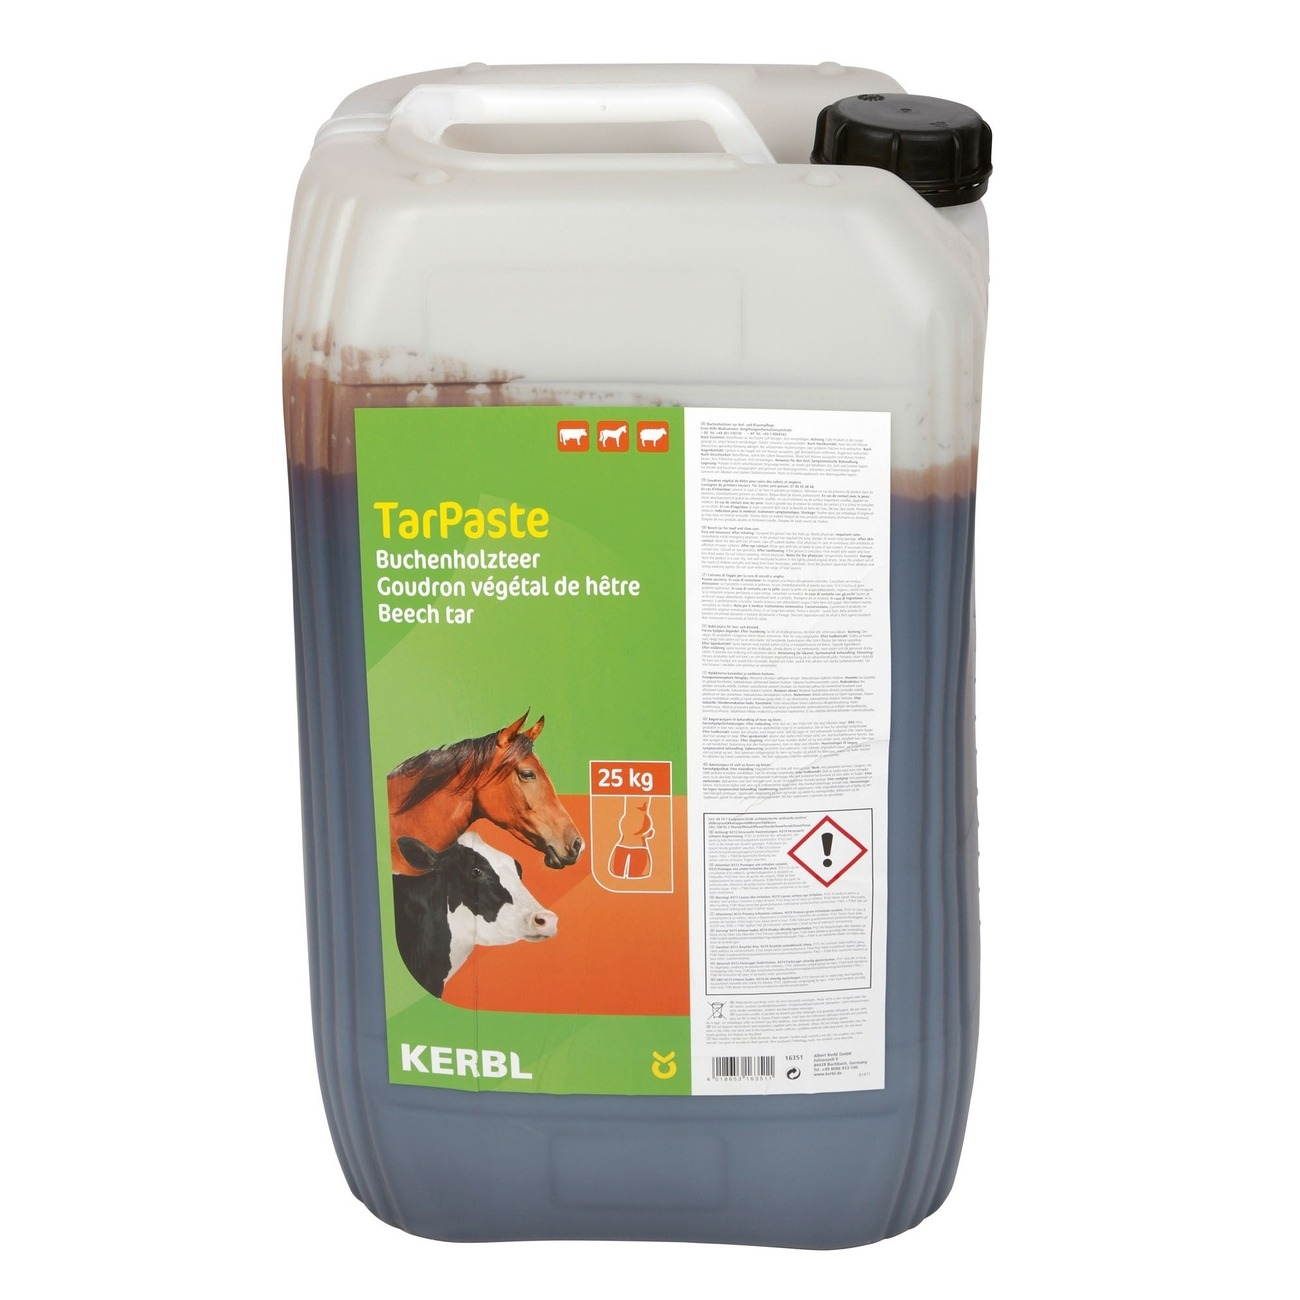 Kerbl Buchenholzteer TarPaste zur Hufpflege, 25 kg